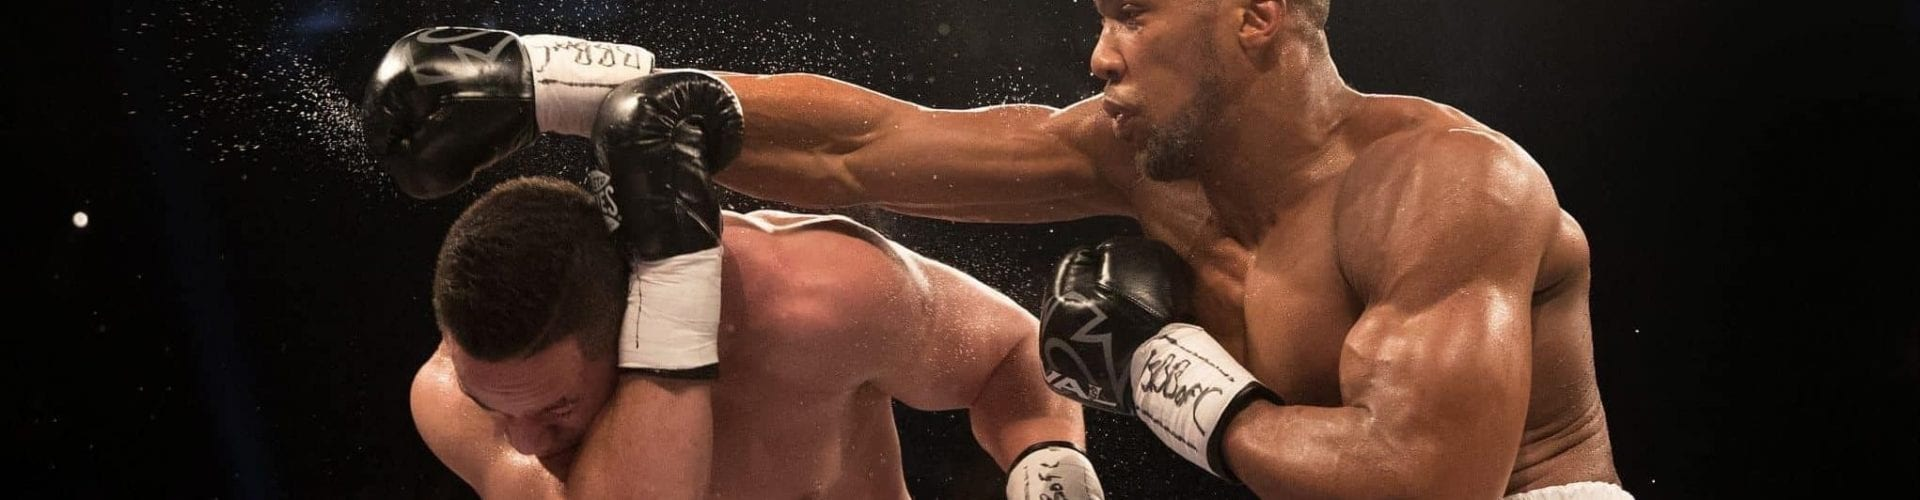 Heavyweight Champ Anthony Joshua Breaks MSG Pre-Sale Record